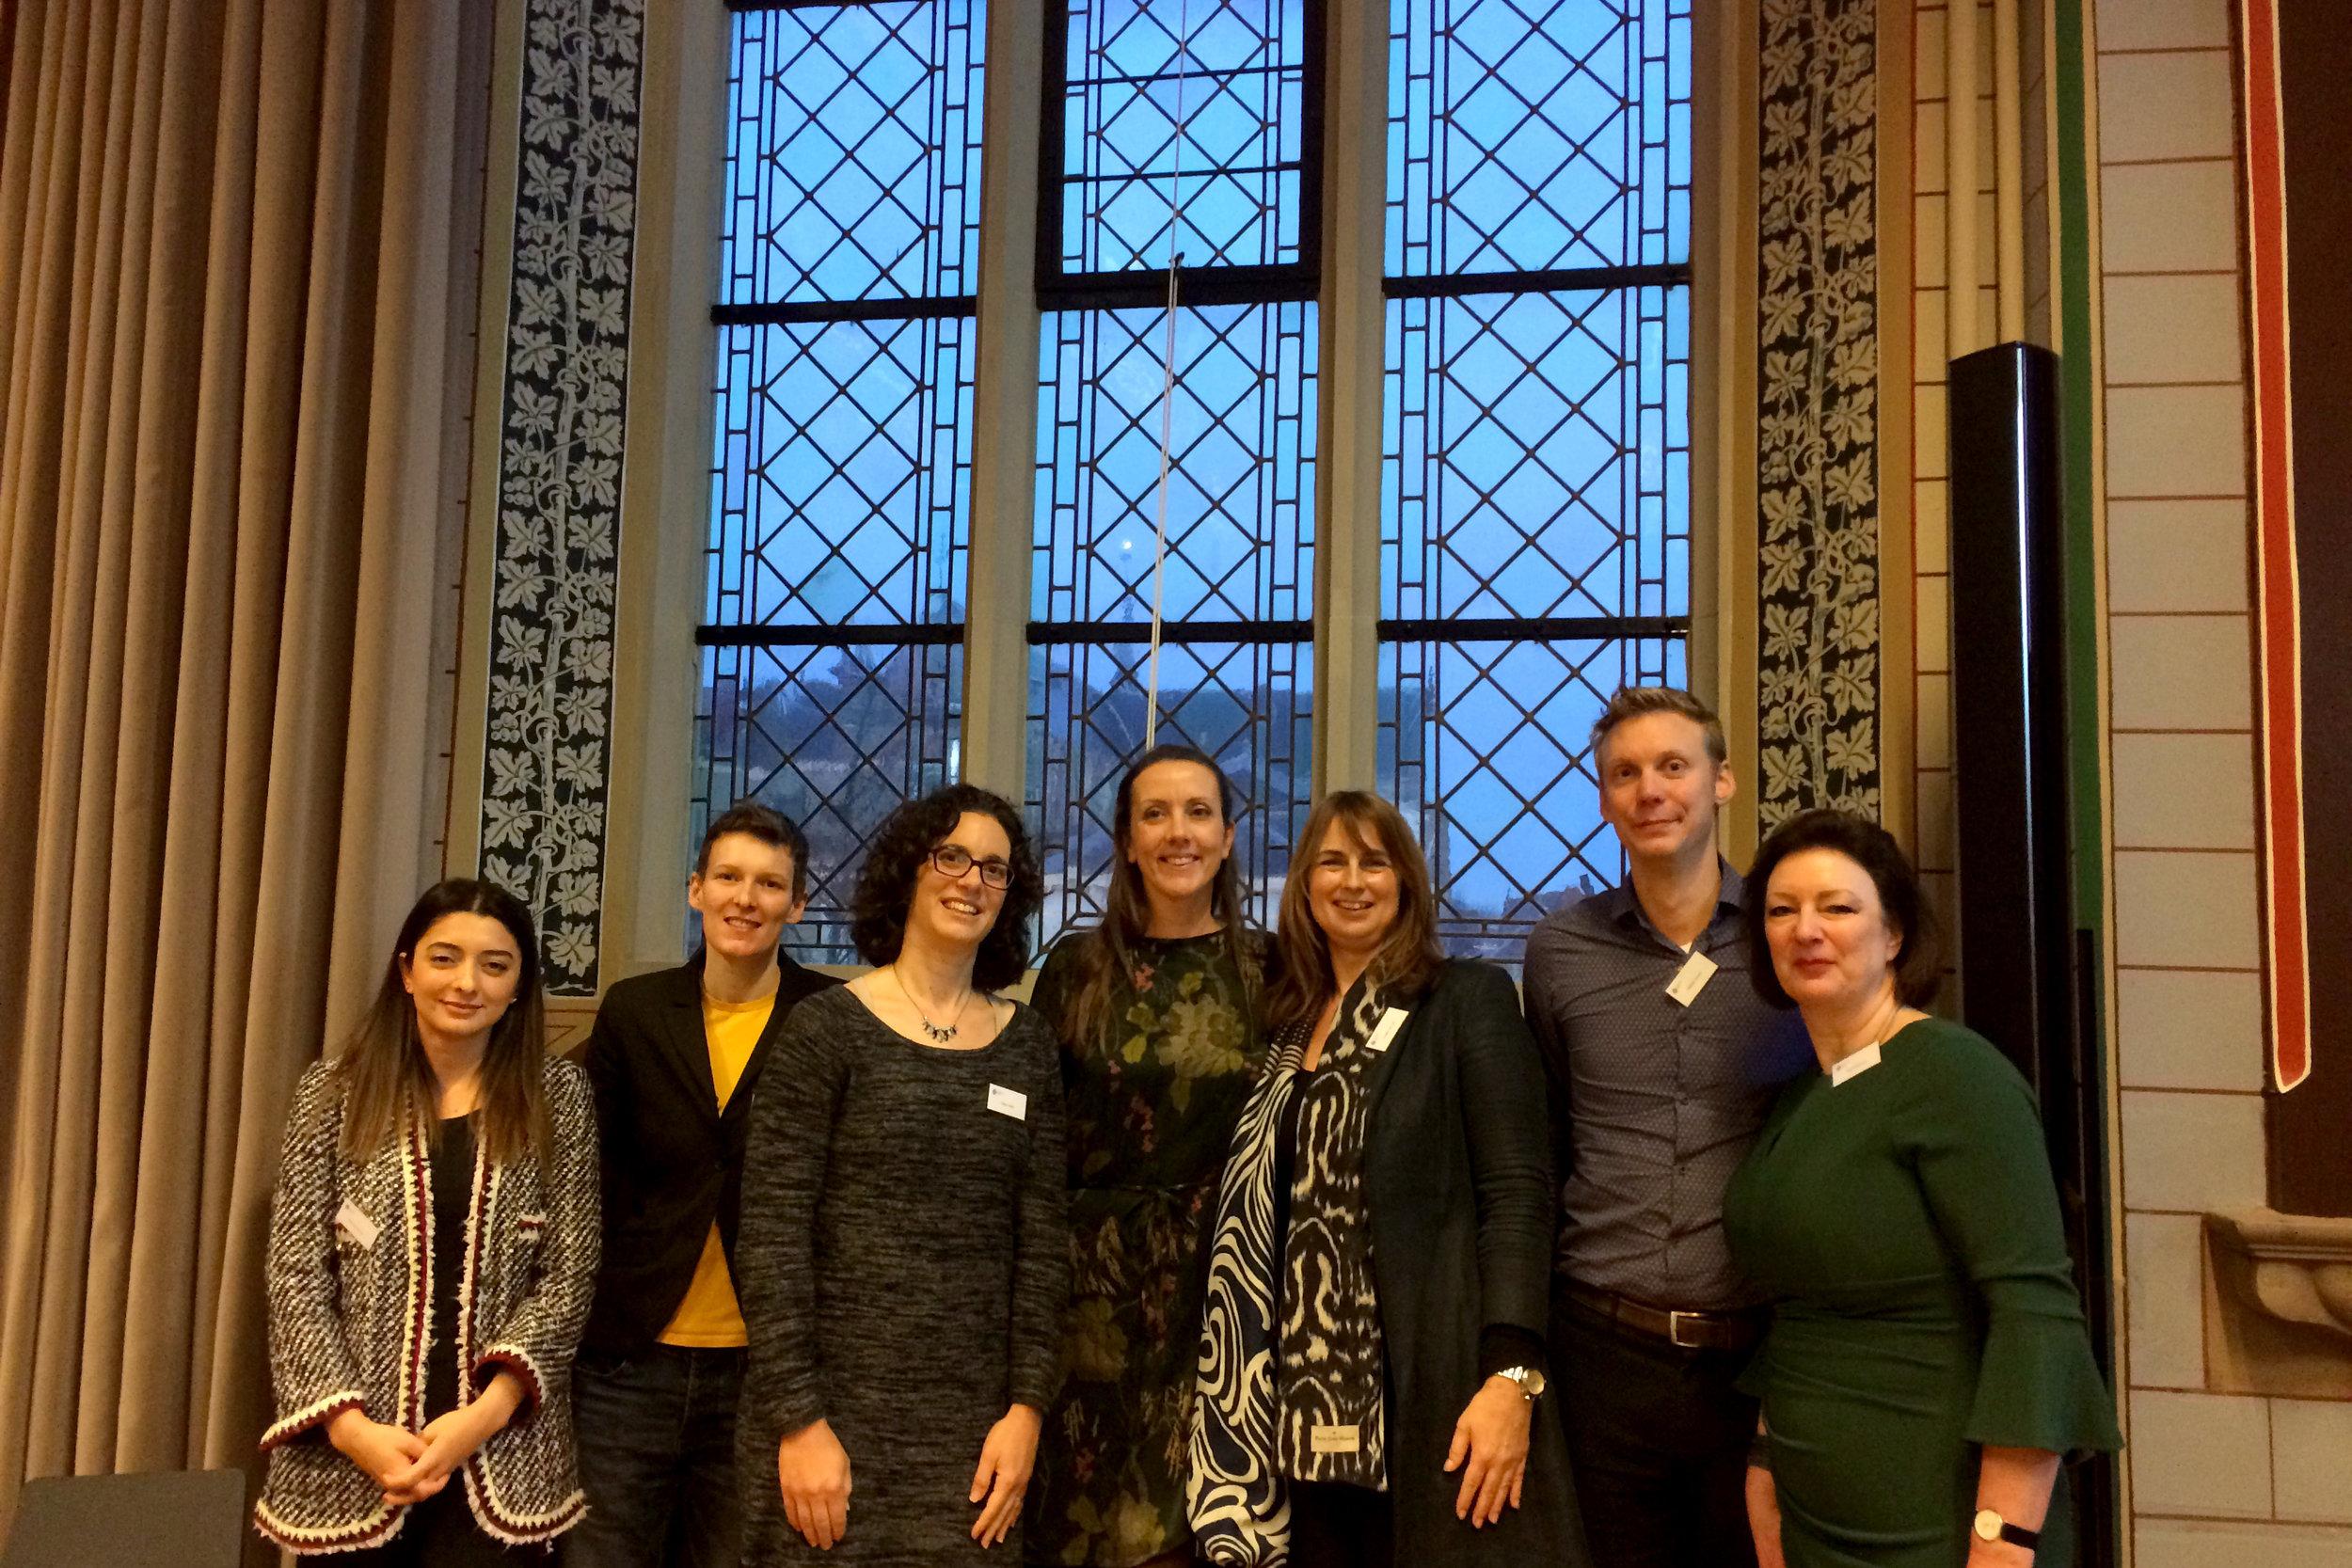 Speakers from left to right: Seval Gündemir, Thekla Morgenroth, Cheryl Kaiser, Jojanneke van der Toorn, Colette van Laar, Wiebren Jansen, Naomi Ellemers